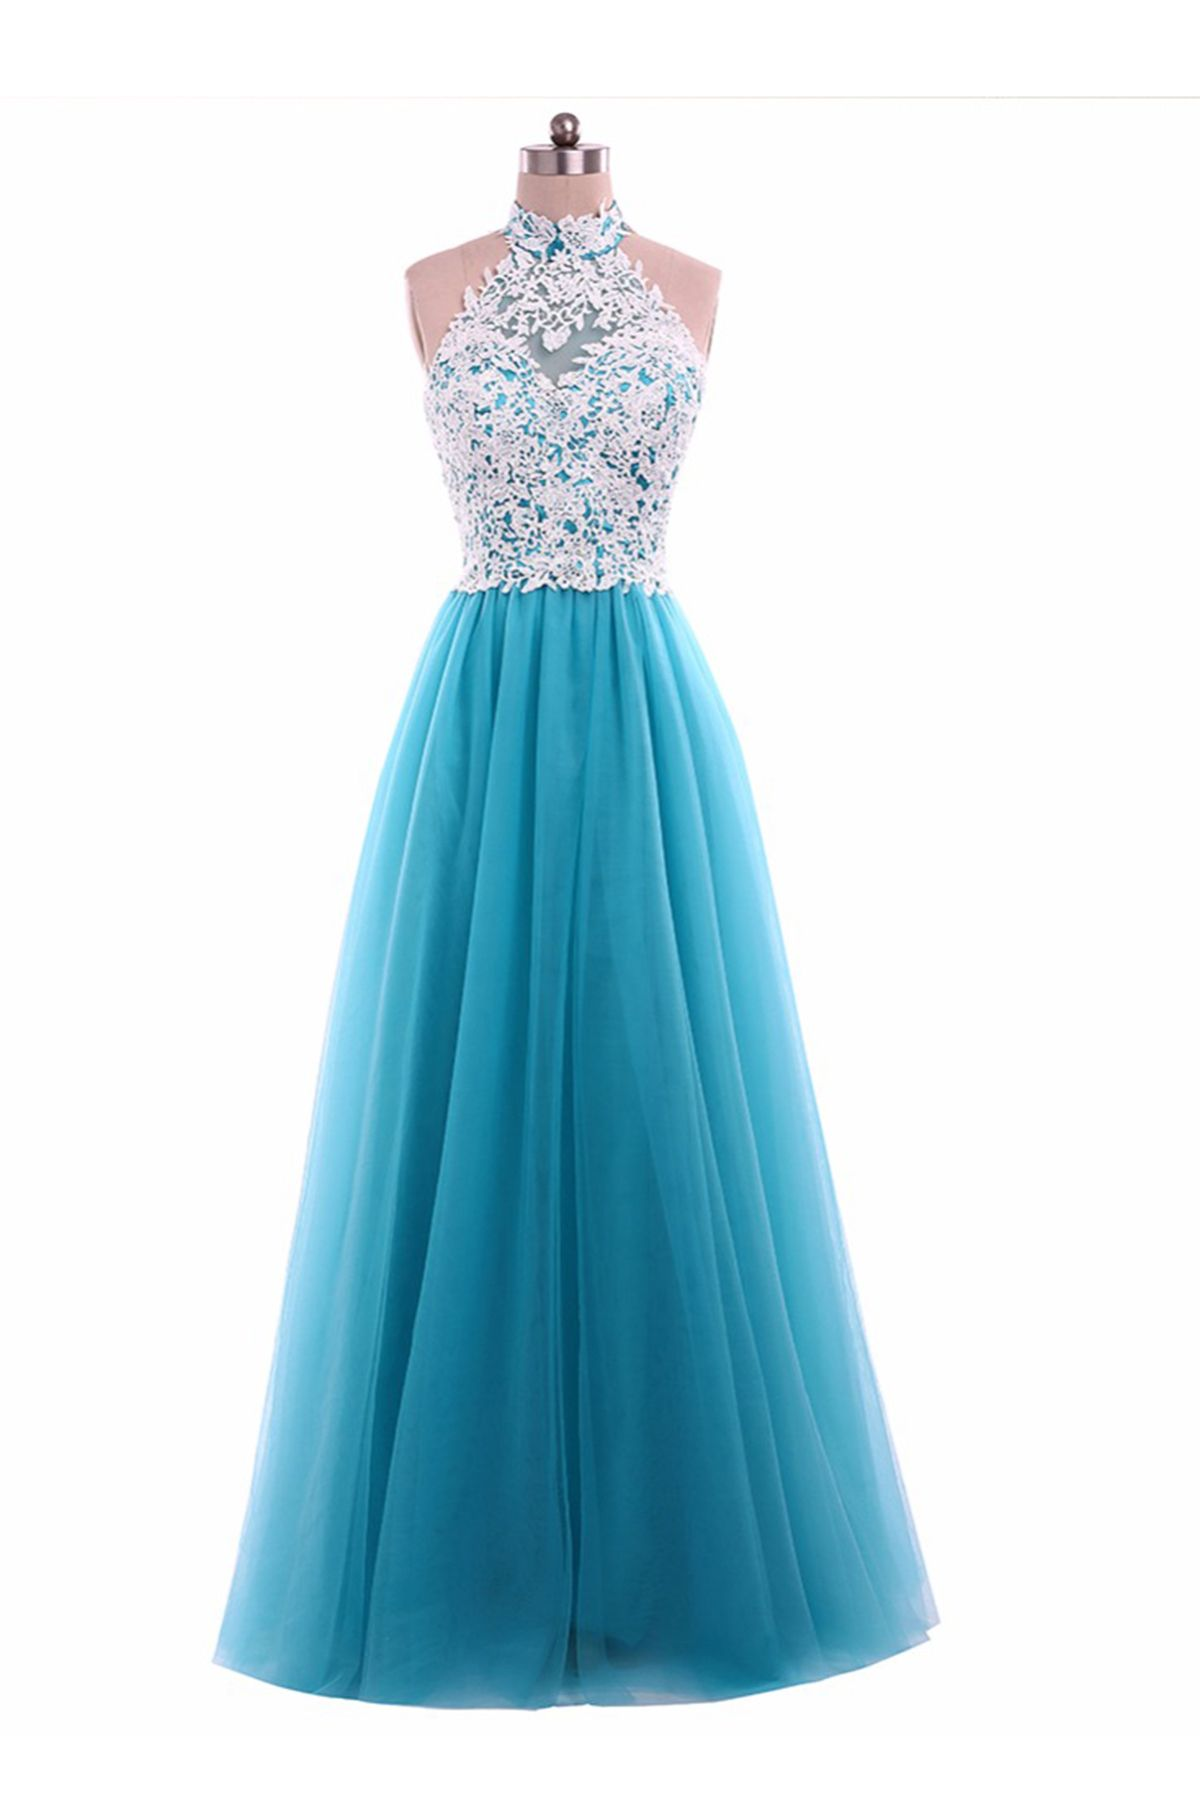 New white lace long A-line senior blue prom dress, halter prom dress ...